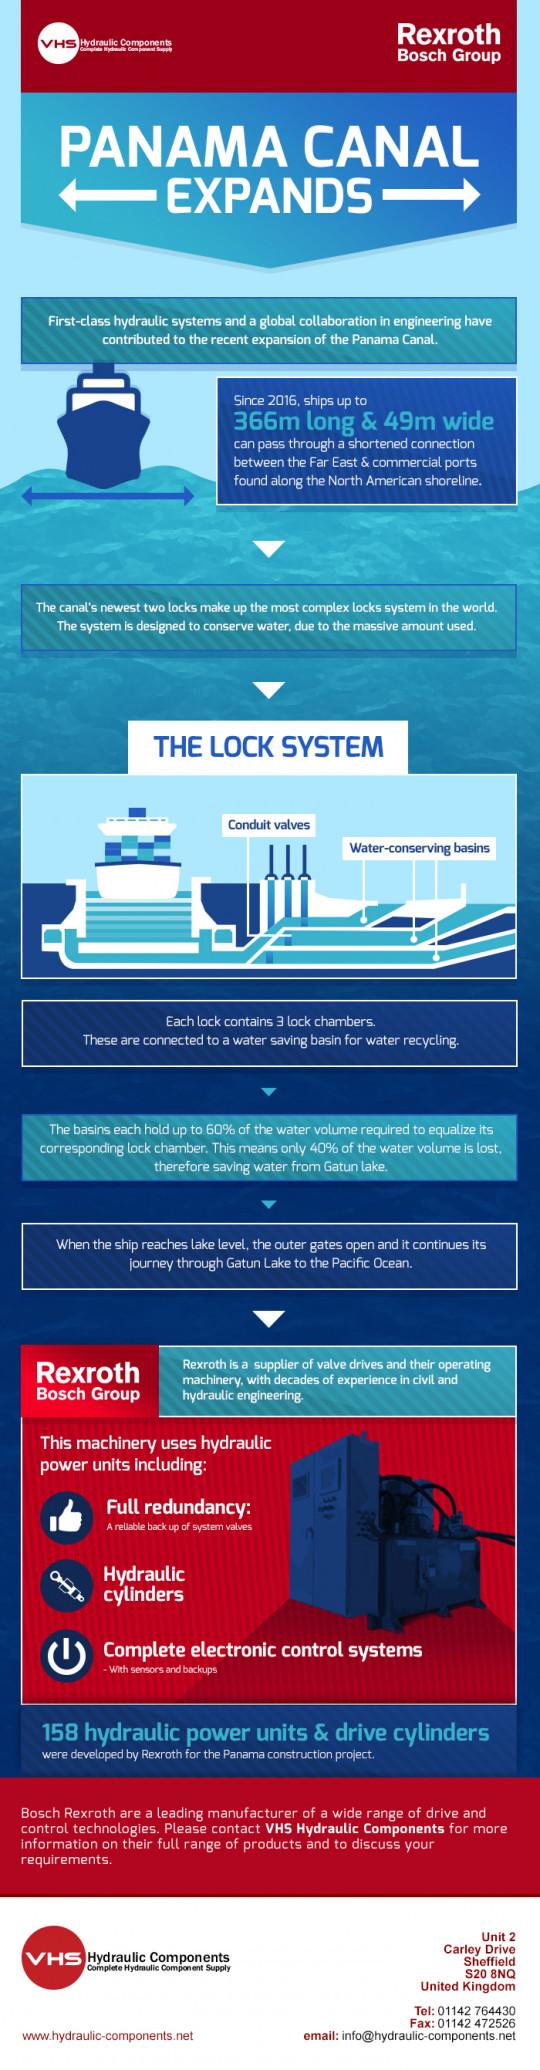 Panama Canal Expands